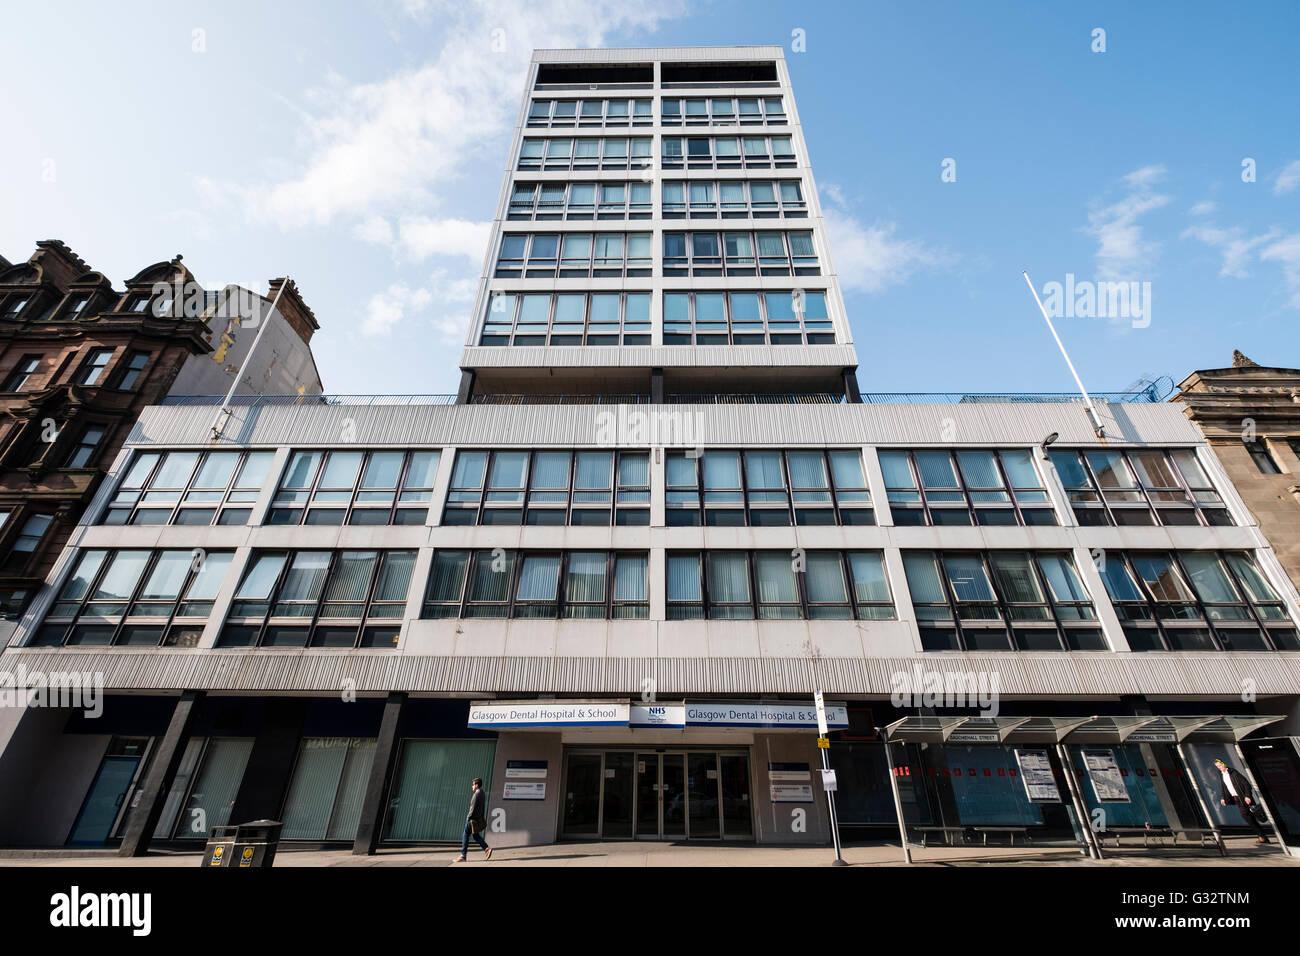 Exterior of  NHS Glasgow Dental Hospital and School on Sauchiehall Street Glasgow, Scotland, United Kingdom - Stock Image